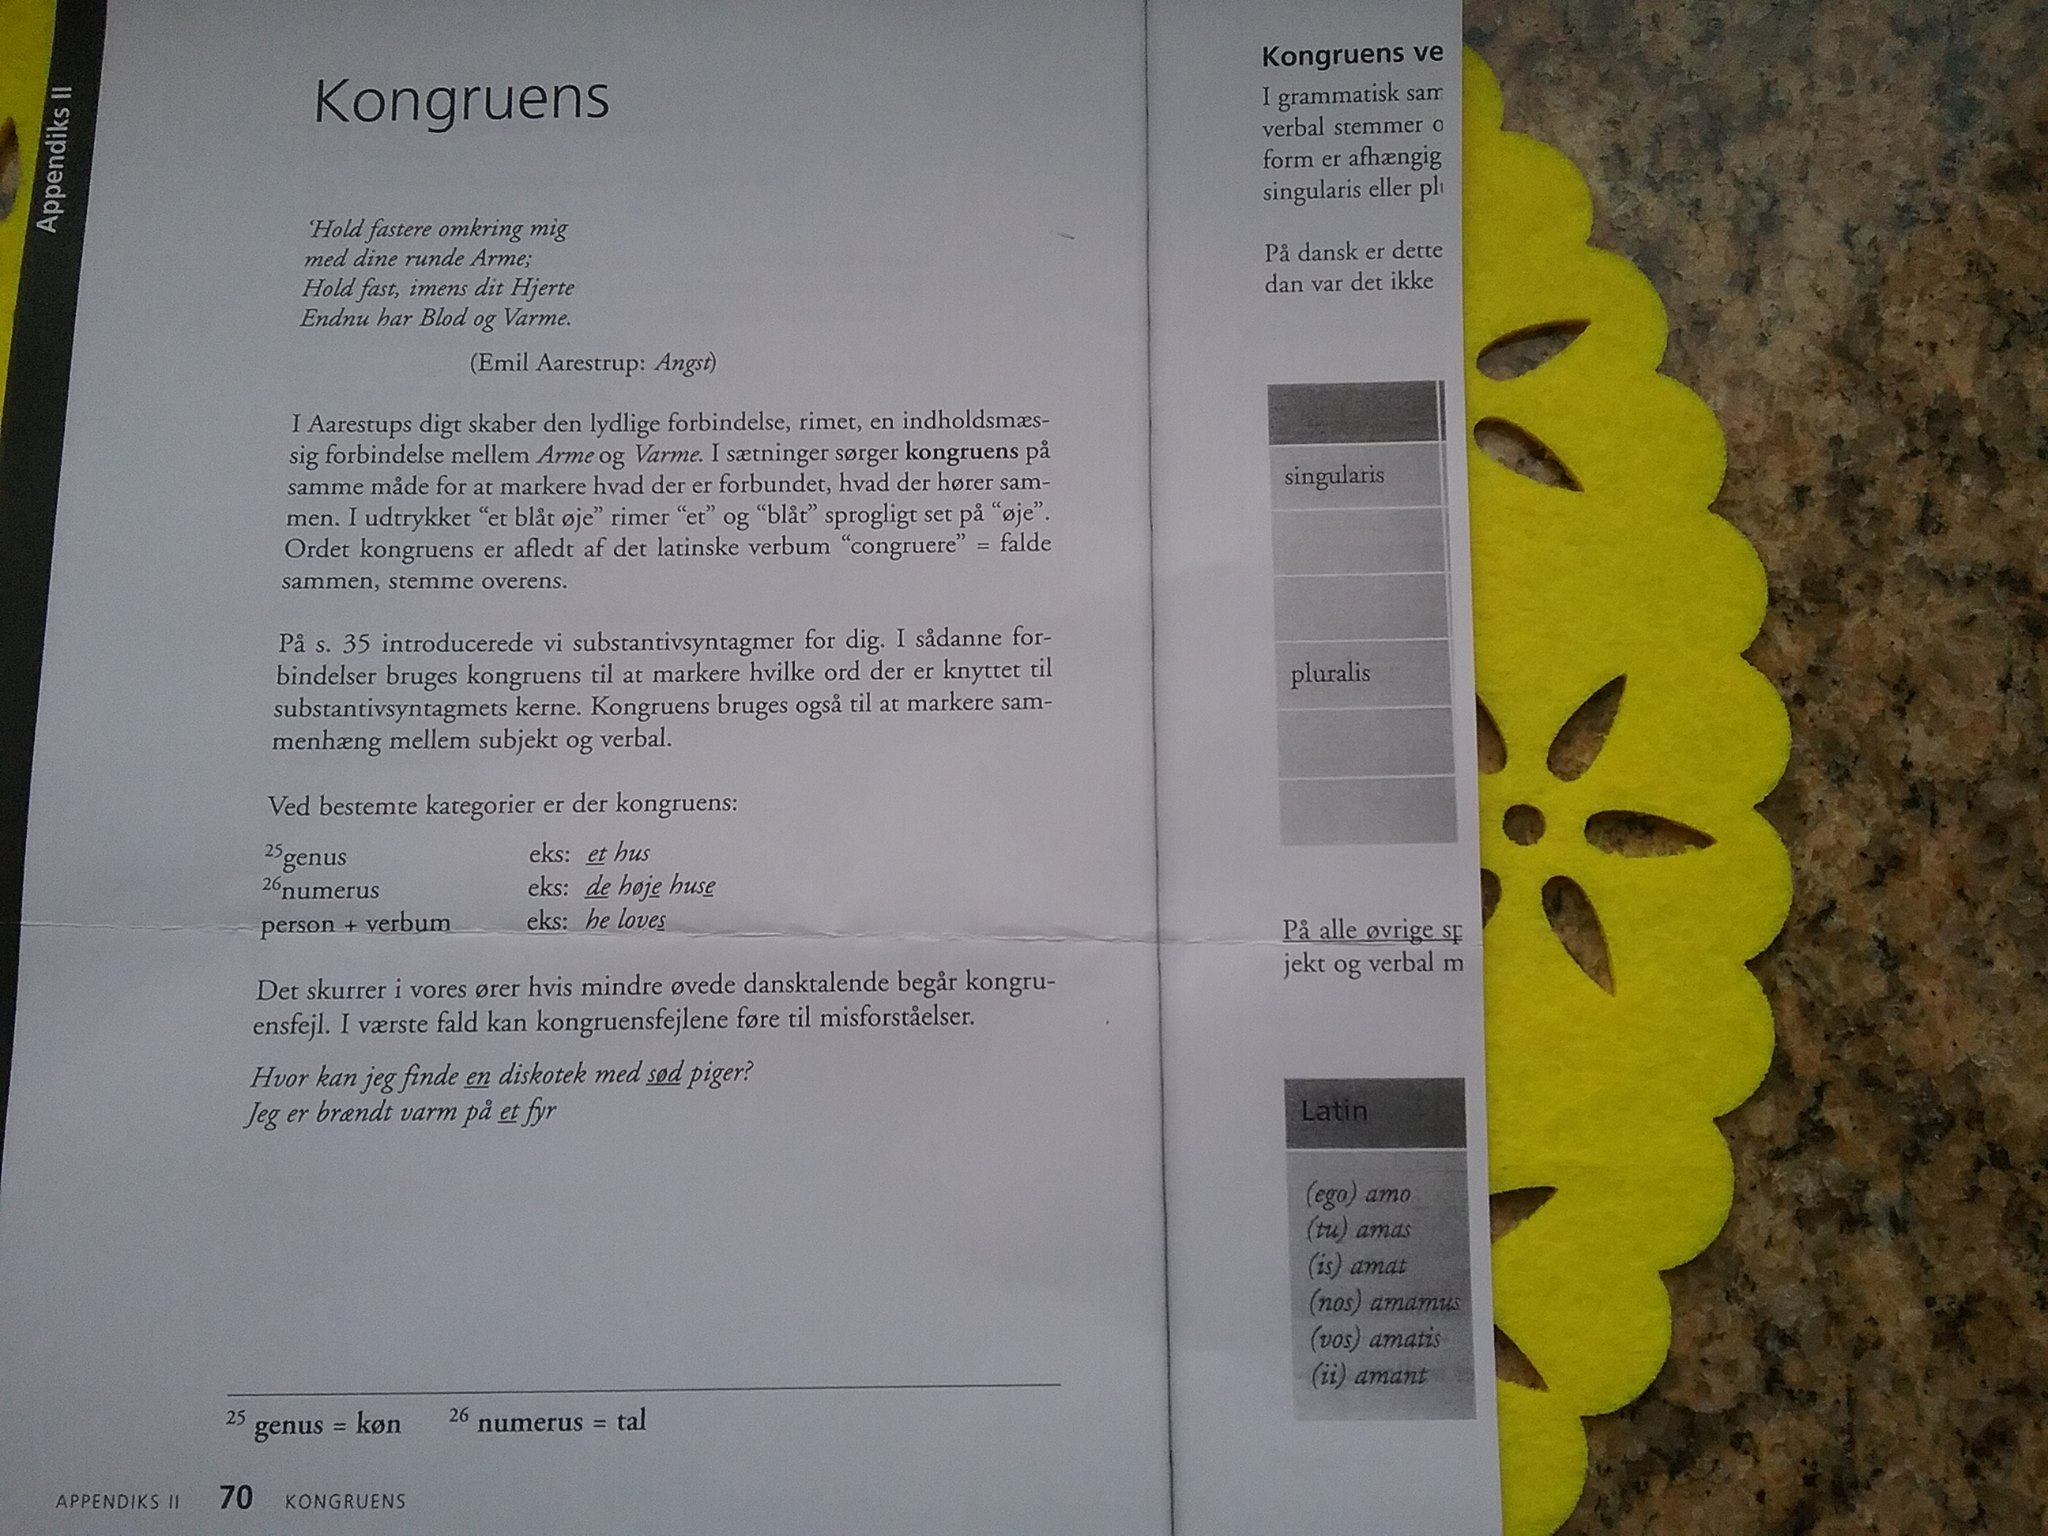 "I grammatiktikbogen Perleporten (1999) bliver ""Angst"" også gjort til sprogligt eksempelmateriale i demonstration ag kongruensbøjninger i det danske sprog."